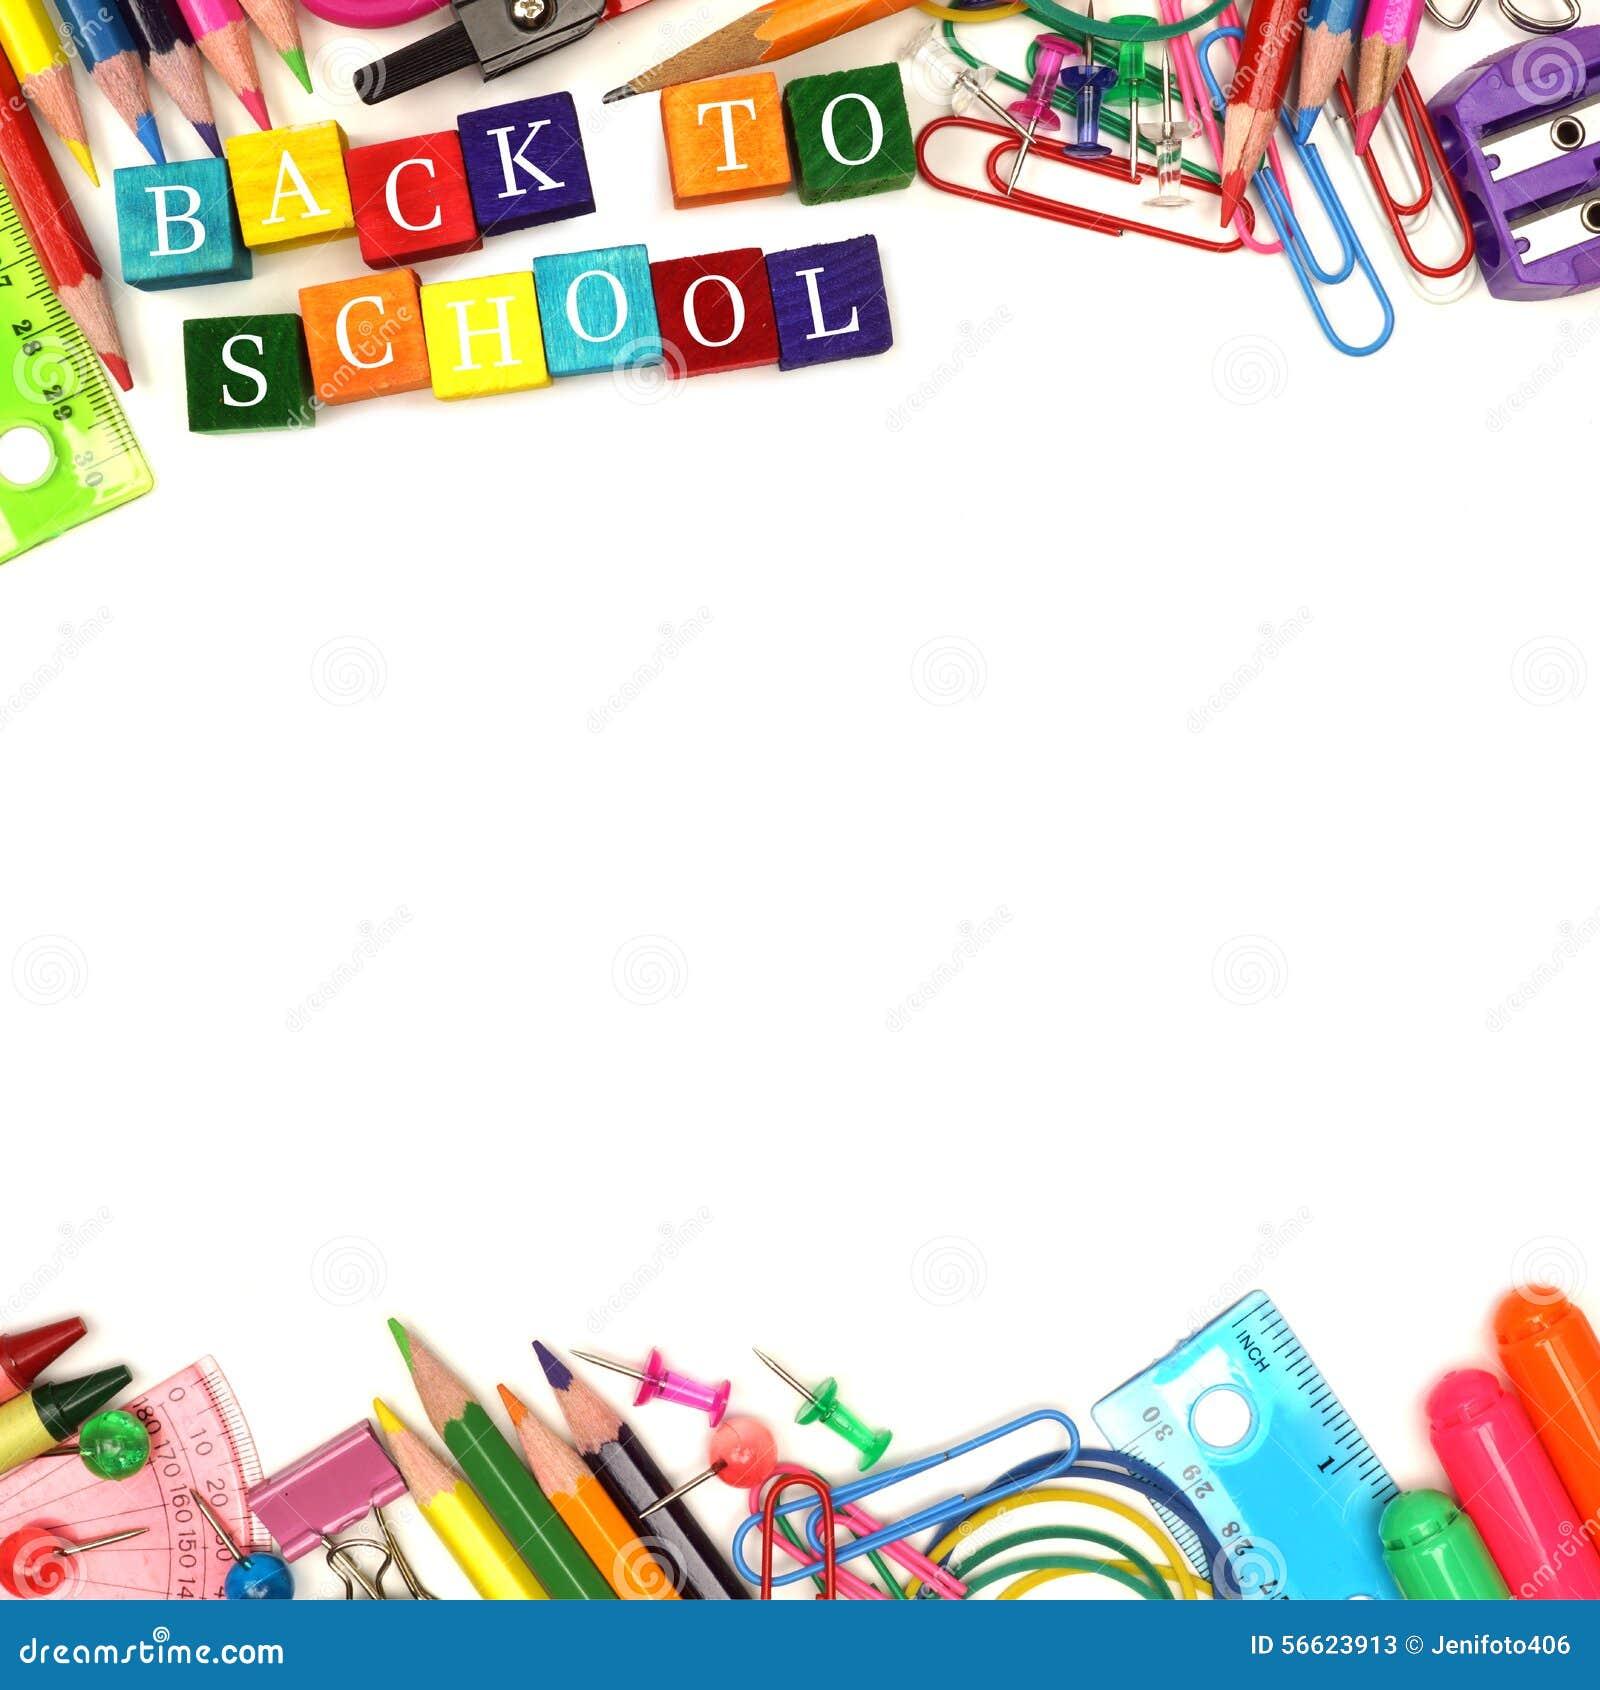 Back To School Supply Box Design